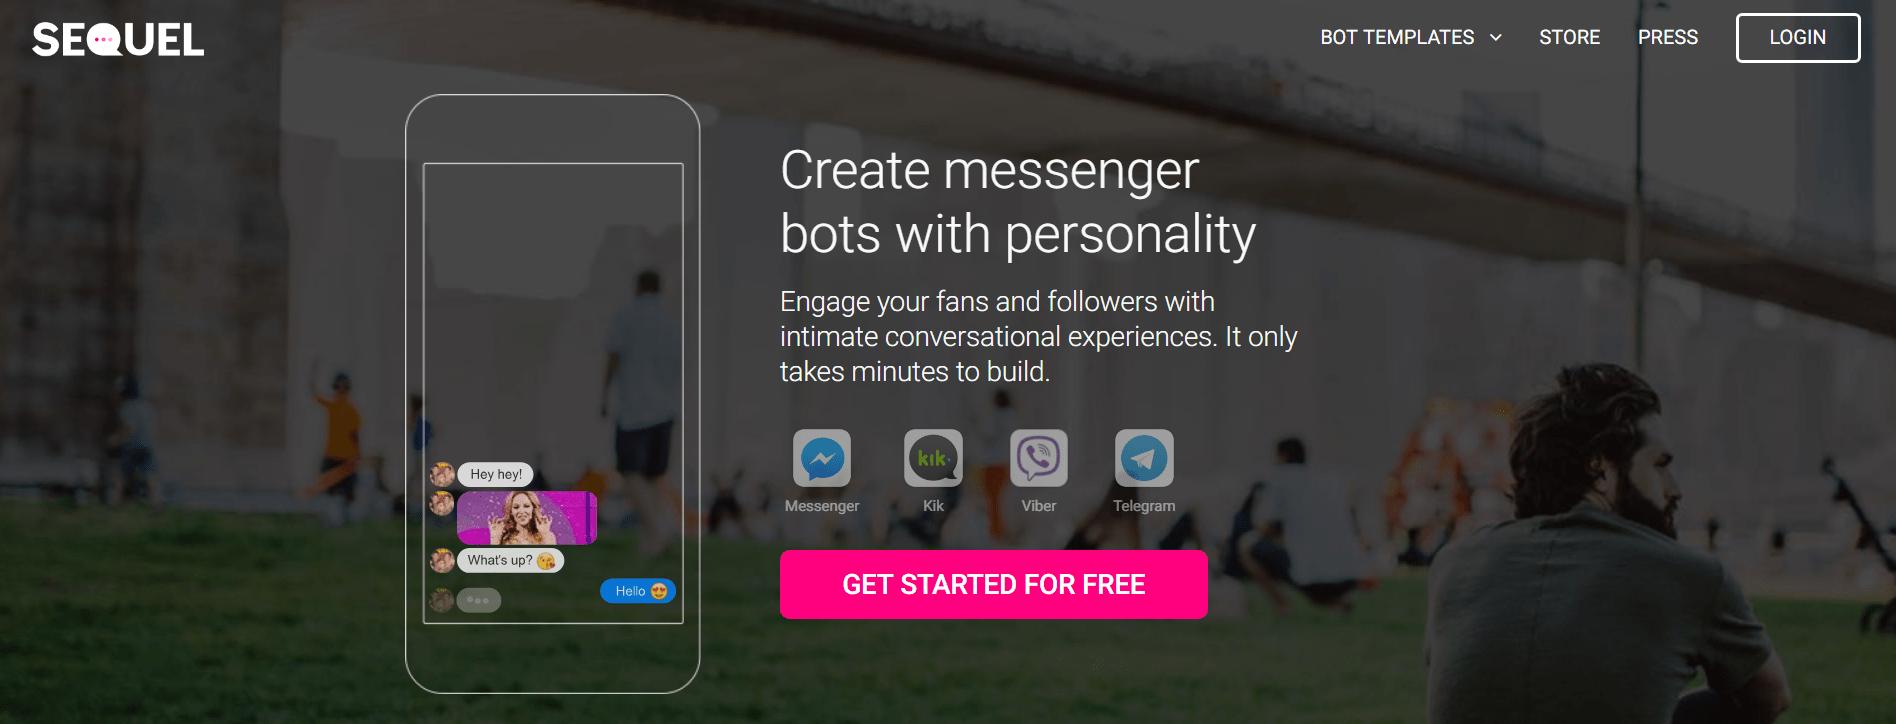 facebook messenger marketing - Sequel landing page